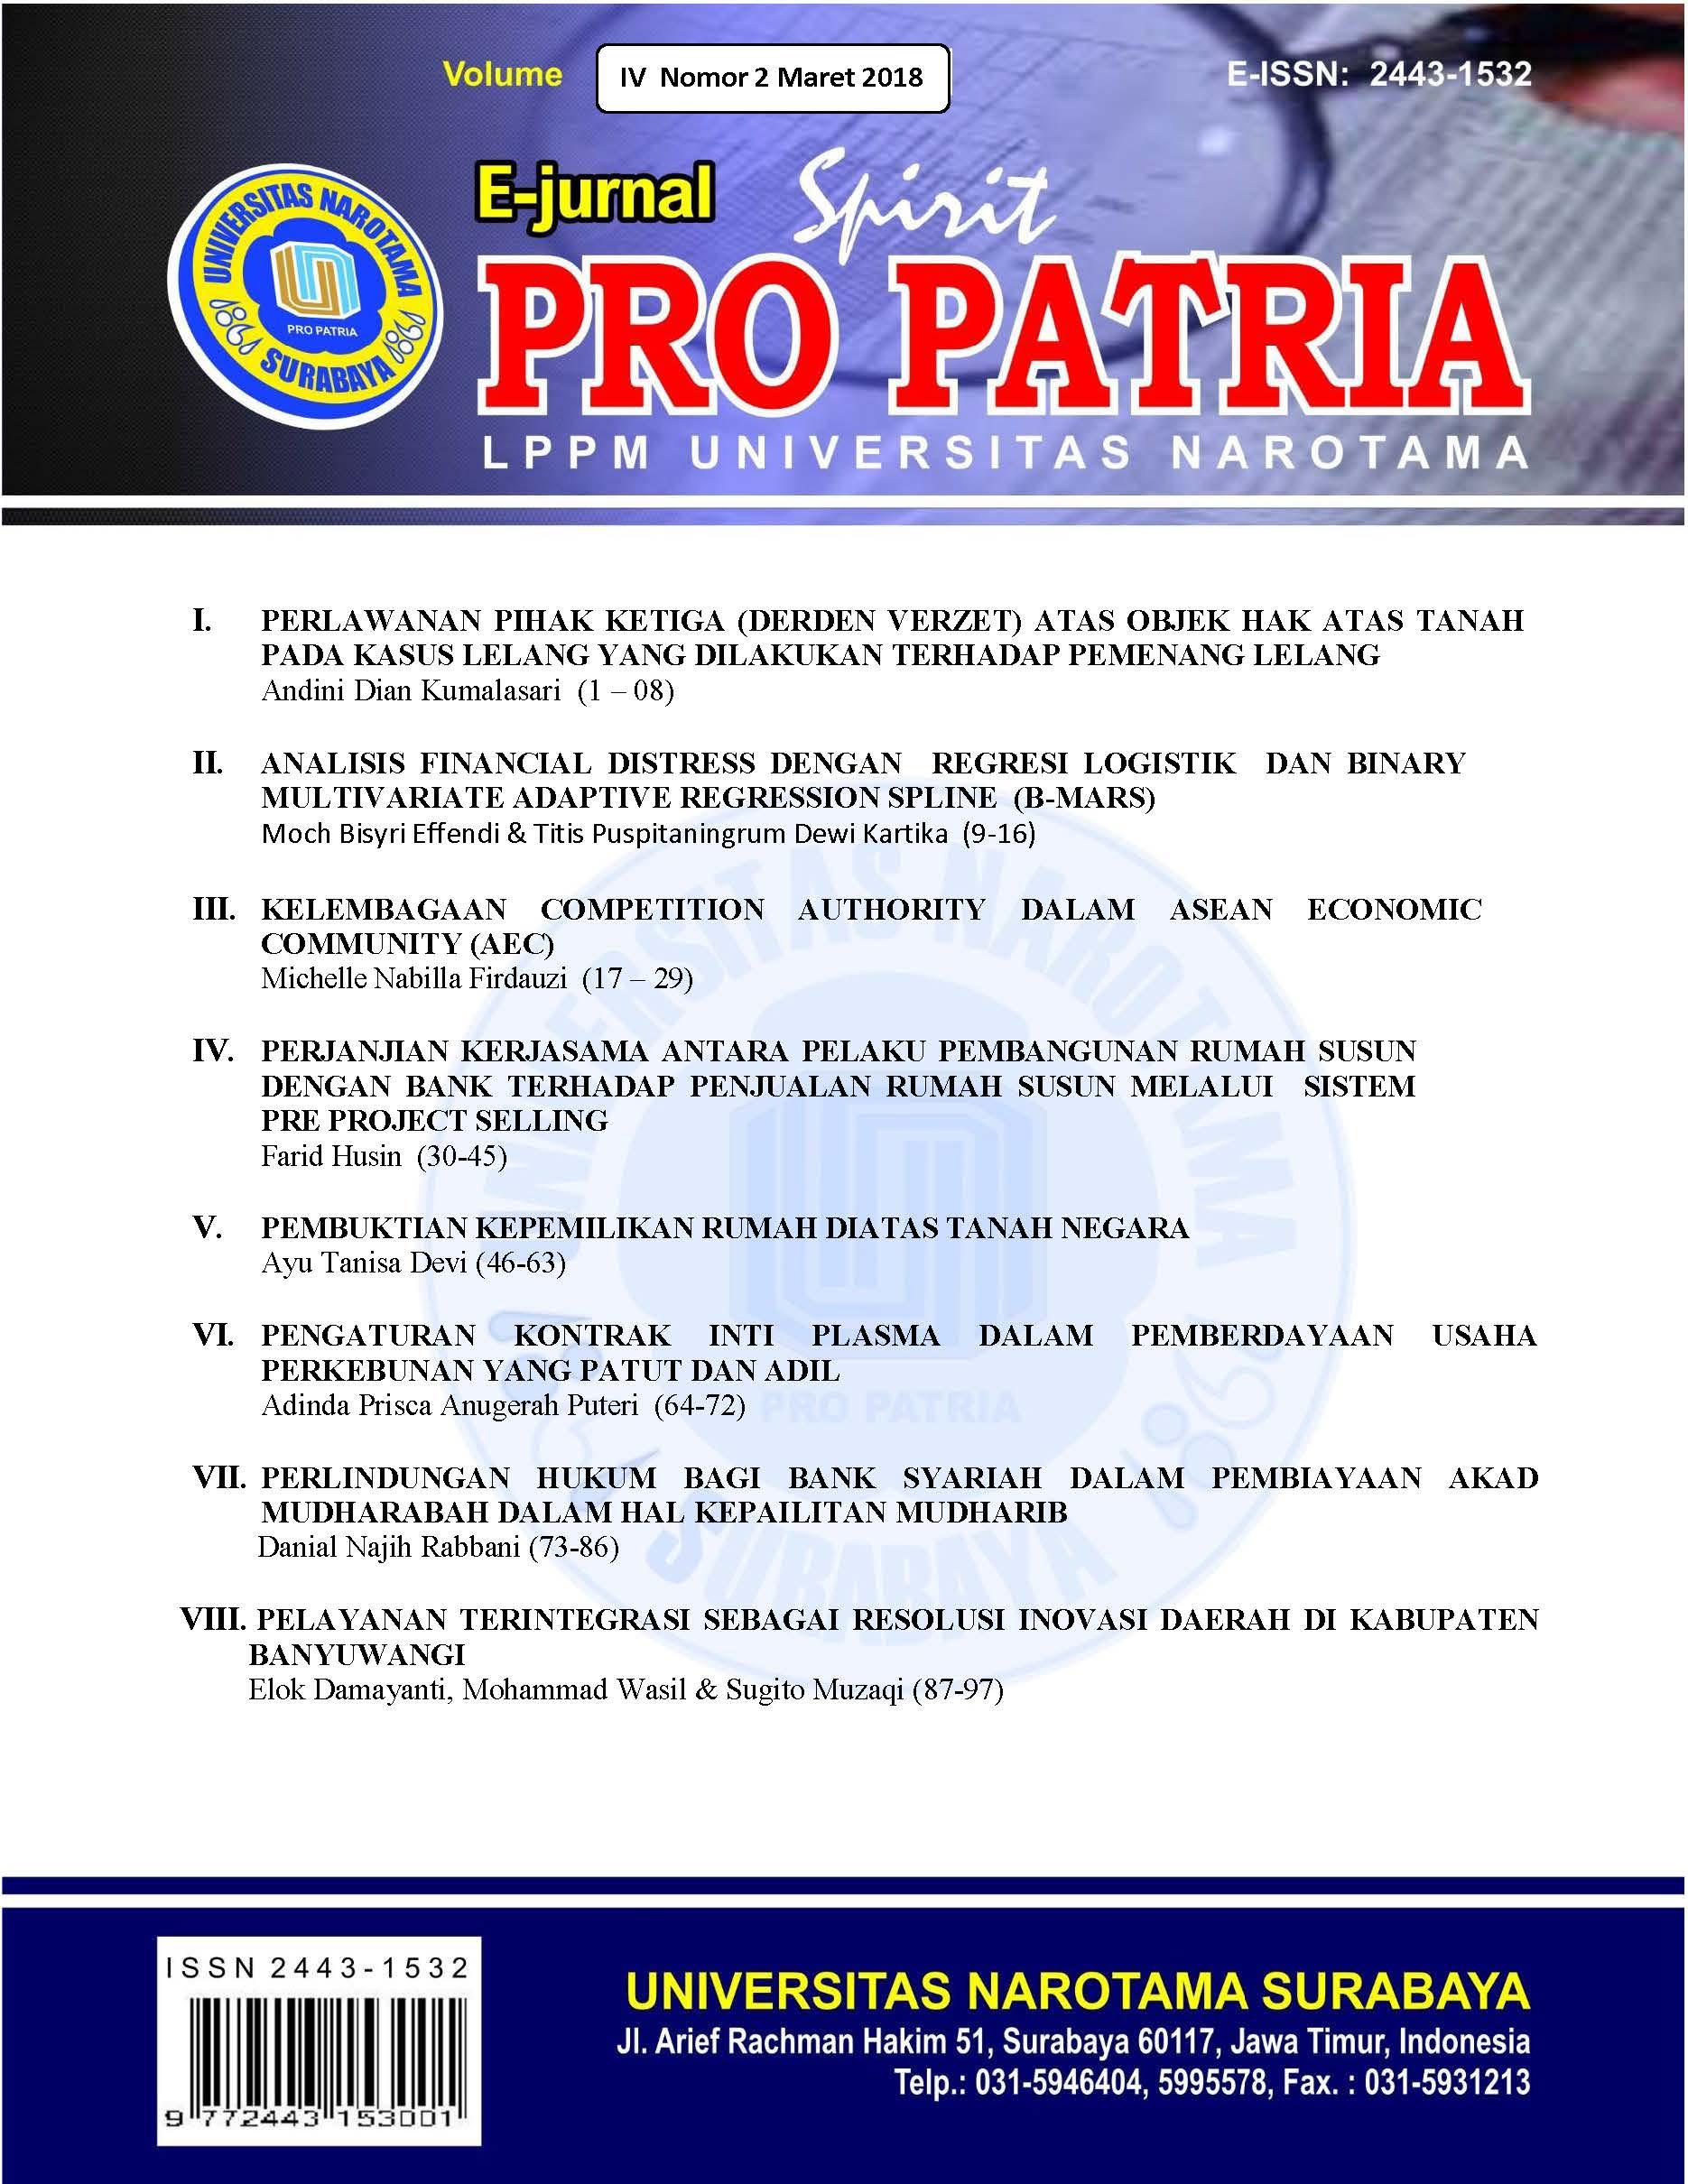 JURNAL SPIRIT PRO PATRIA